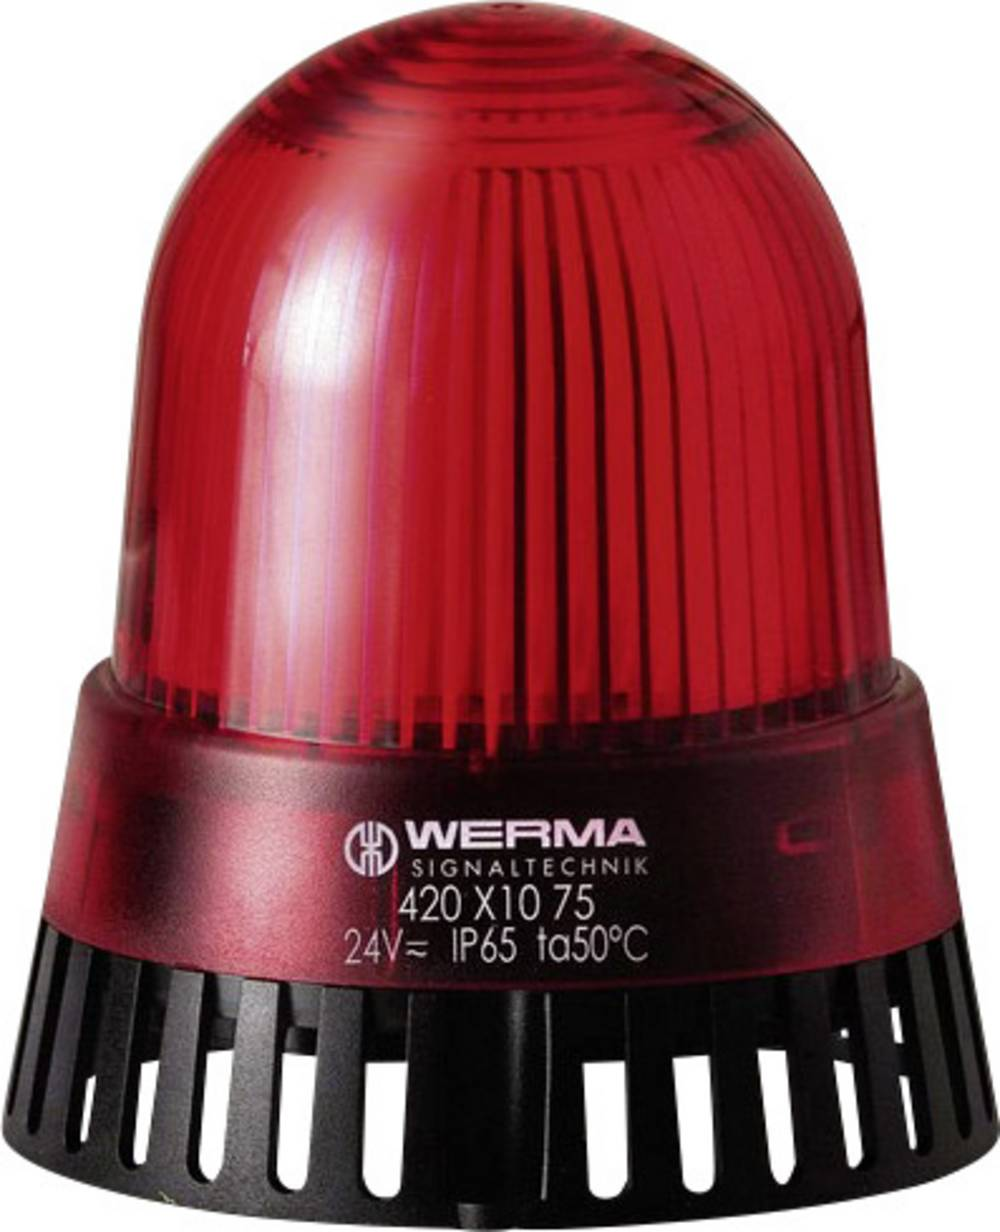 Kombinacija LED i brenčala 420 420.110.75 Werma Signaltechnik